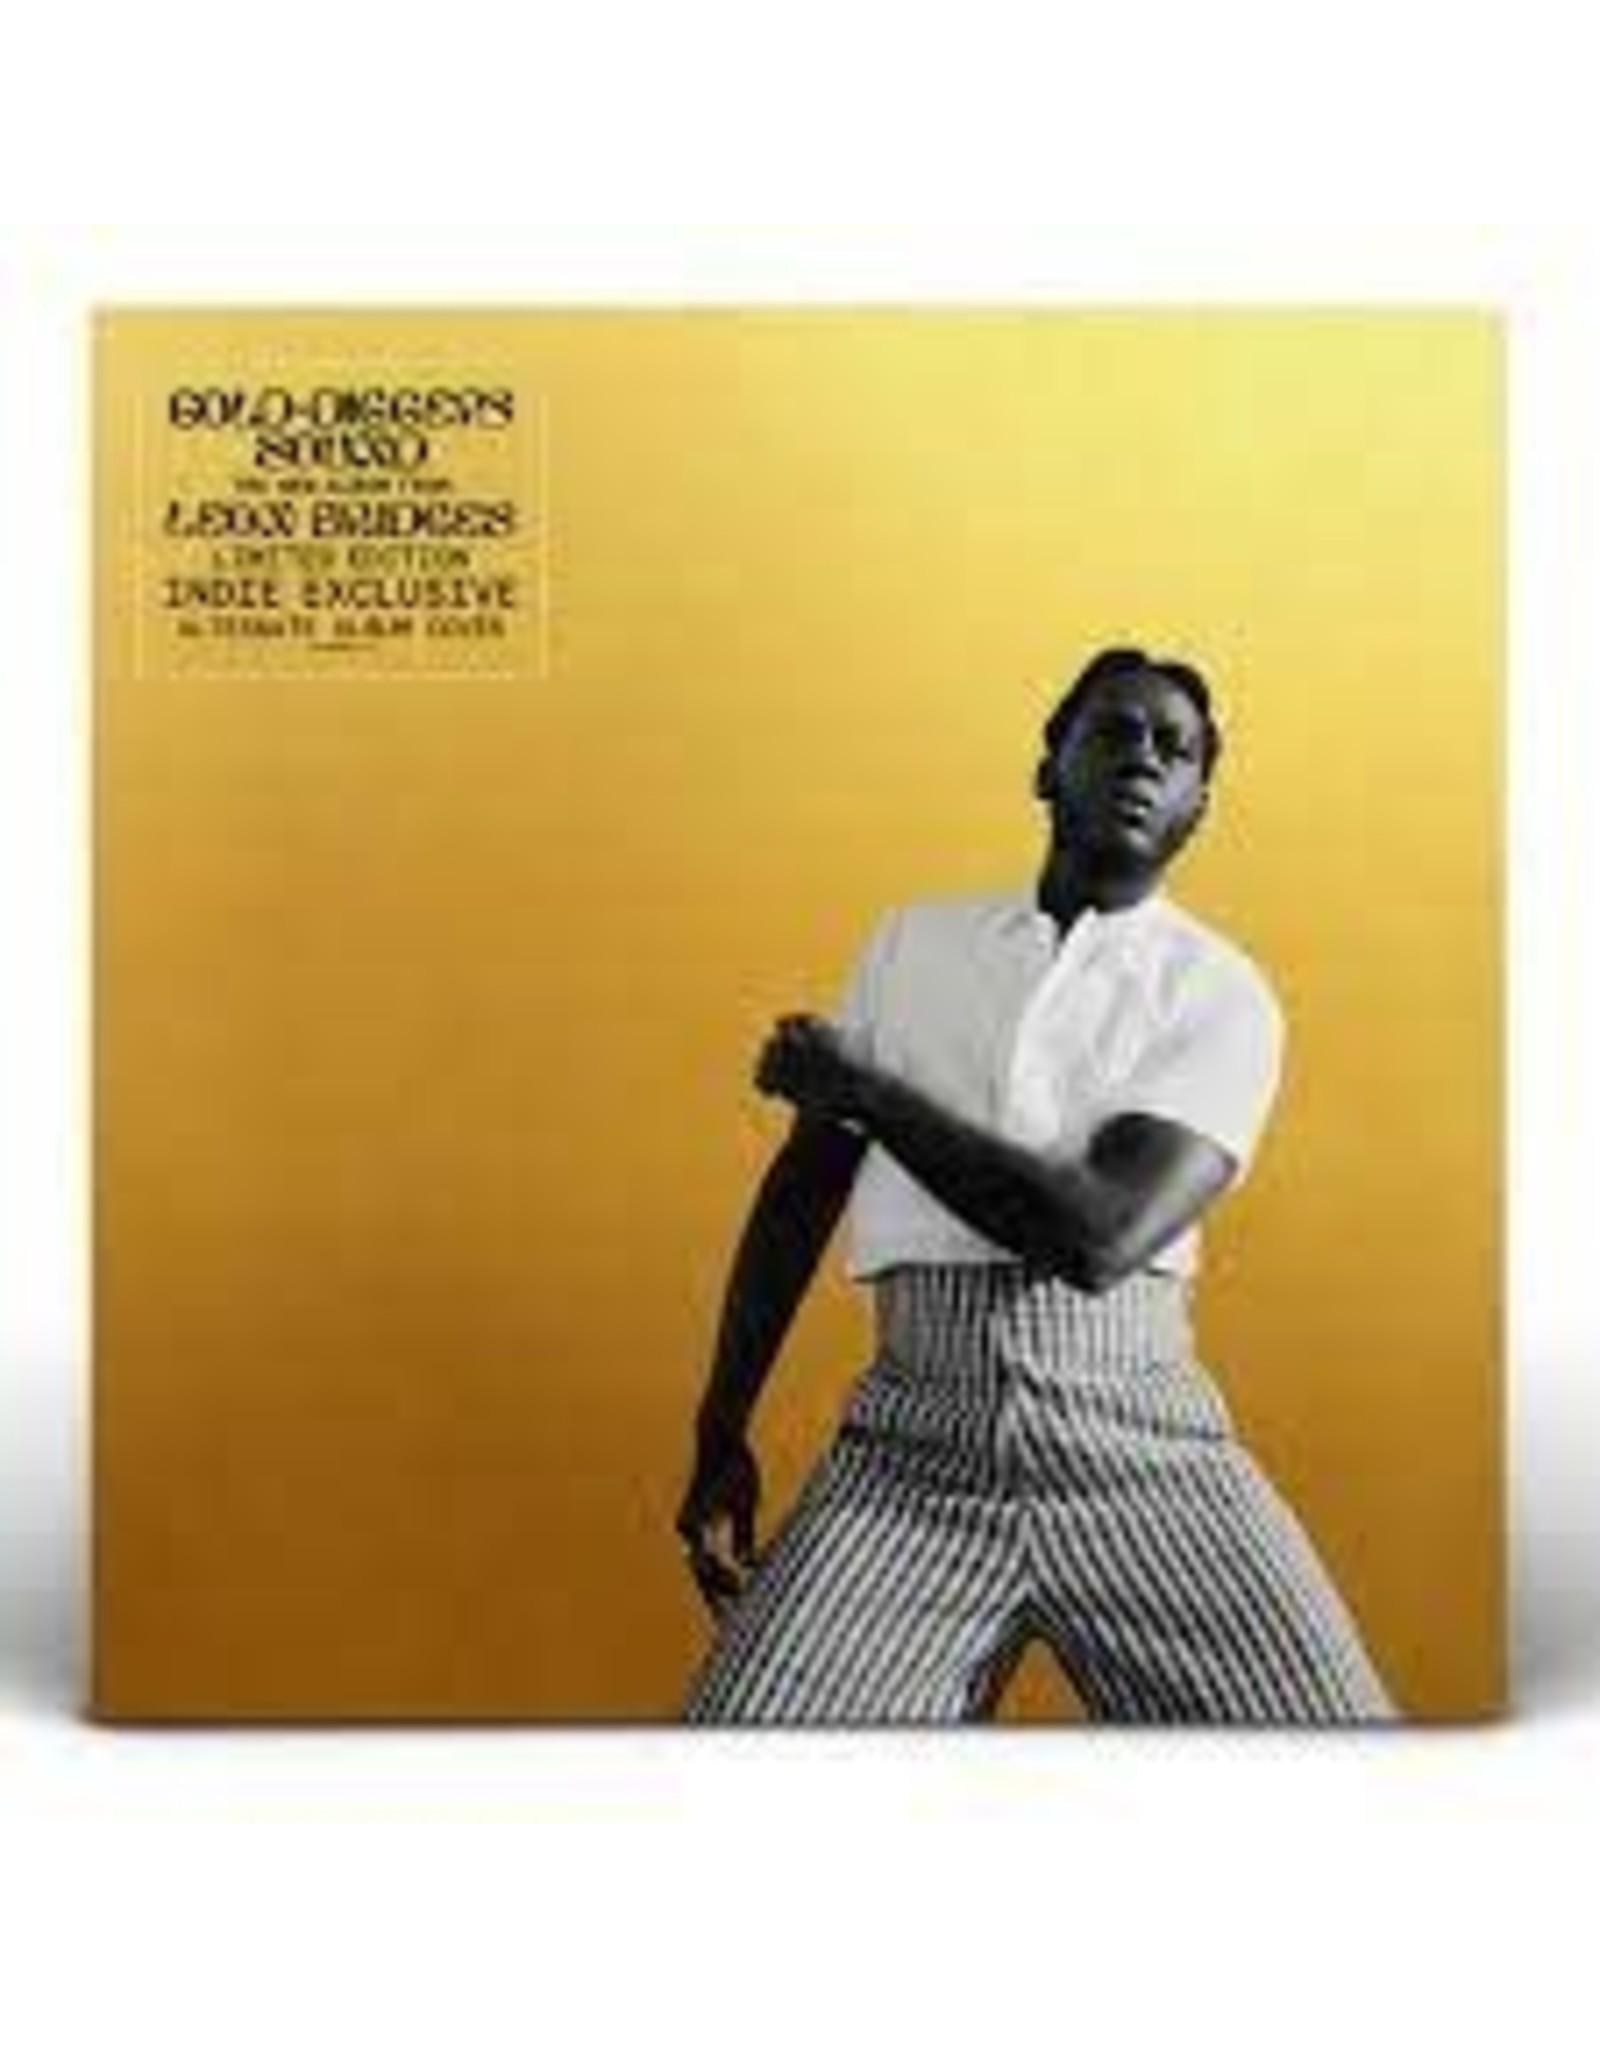 Bridges, Leon - Gold Diggers Sound  INDIE EXCLUSIVE LP